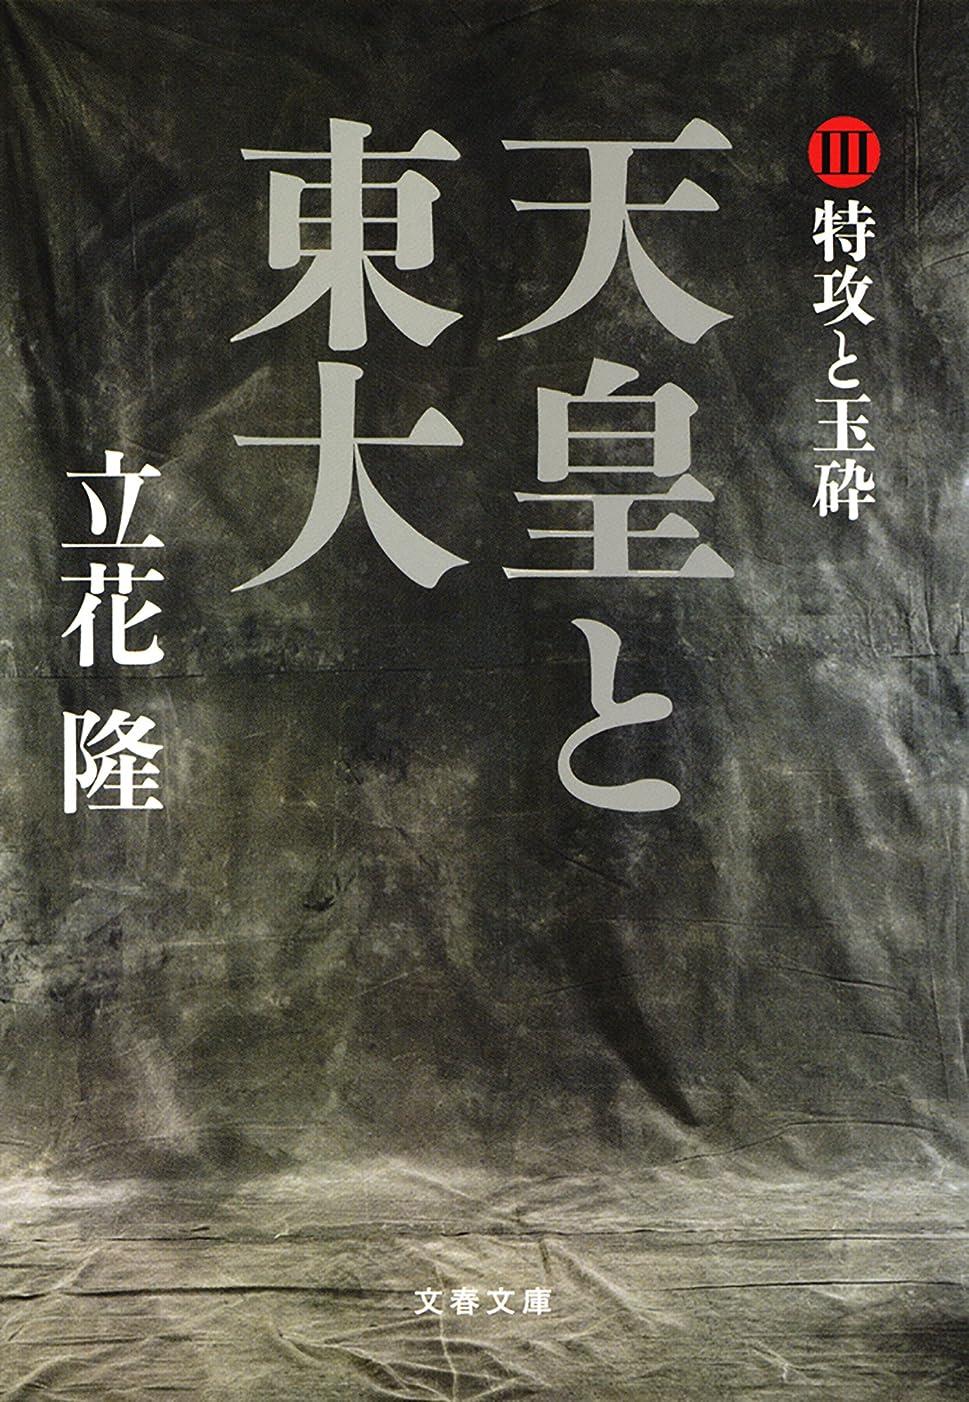 極めて小説狂乱天皇と東大(3) 特攻と玉砕 (文春文庫)